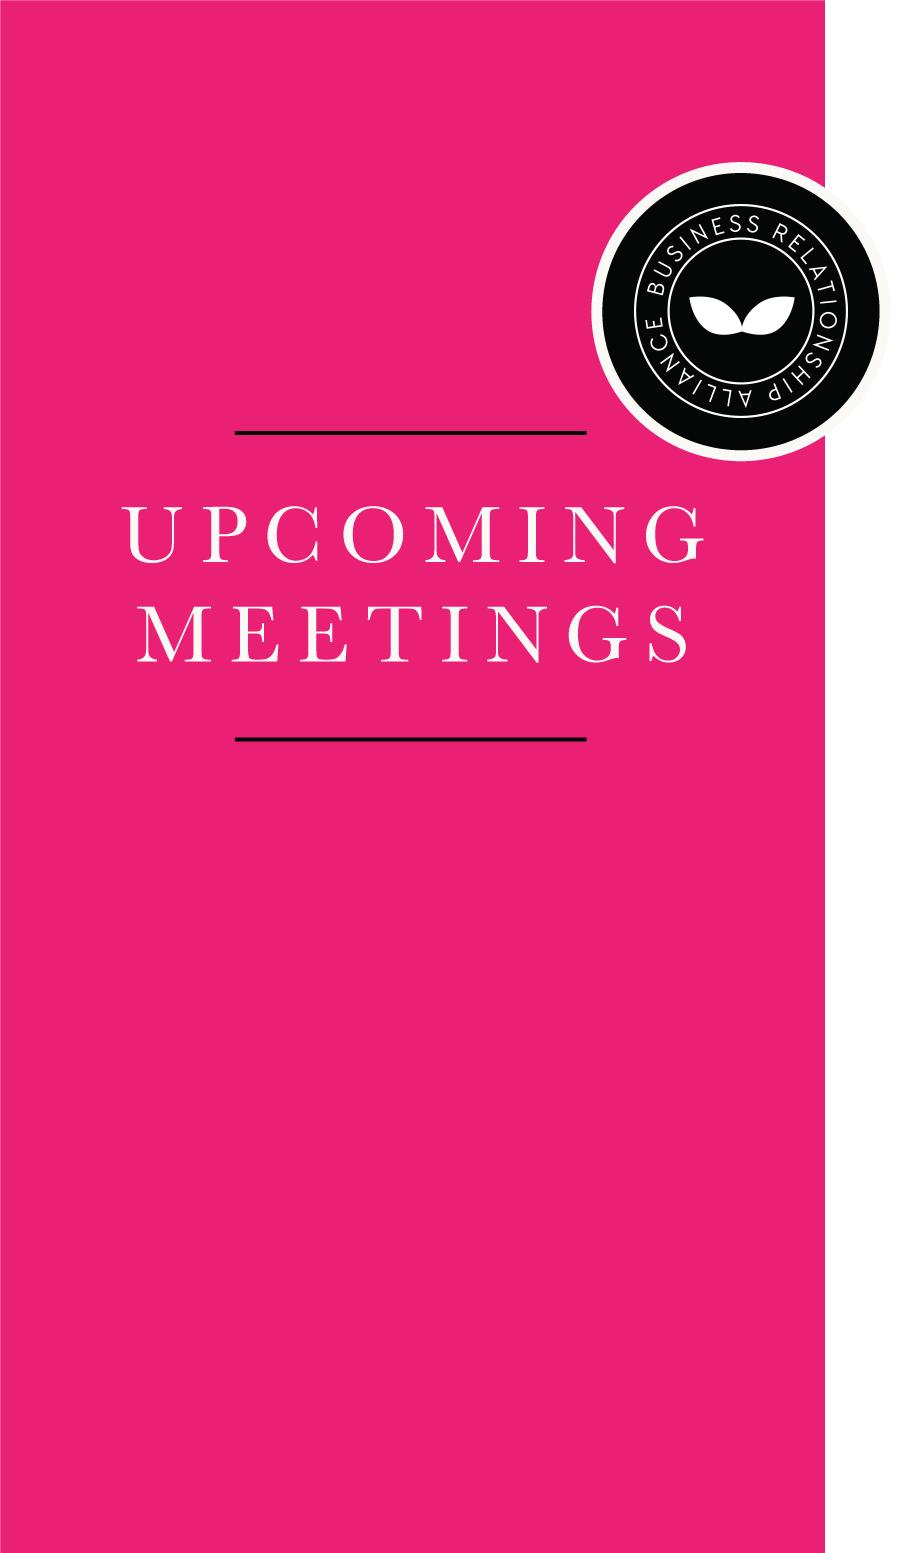 Upcoming-Meetings-long.png